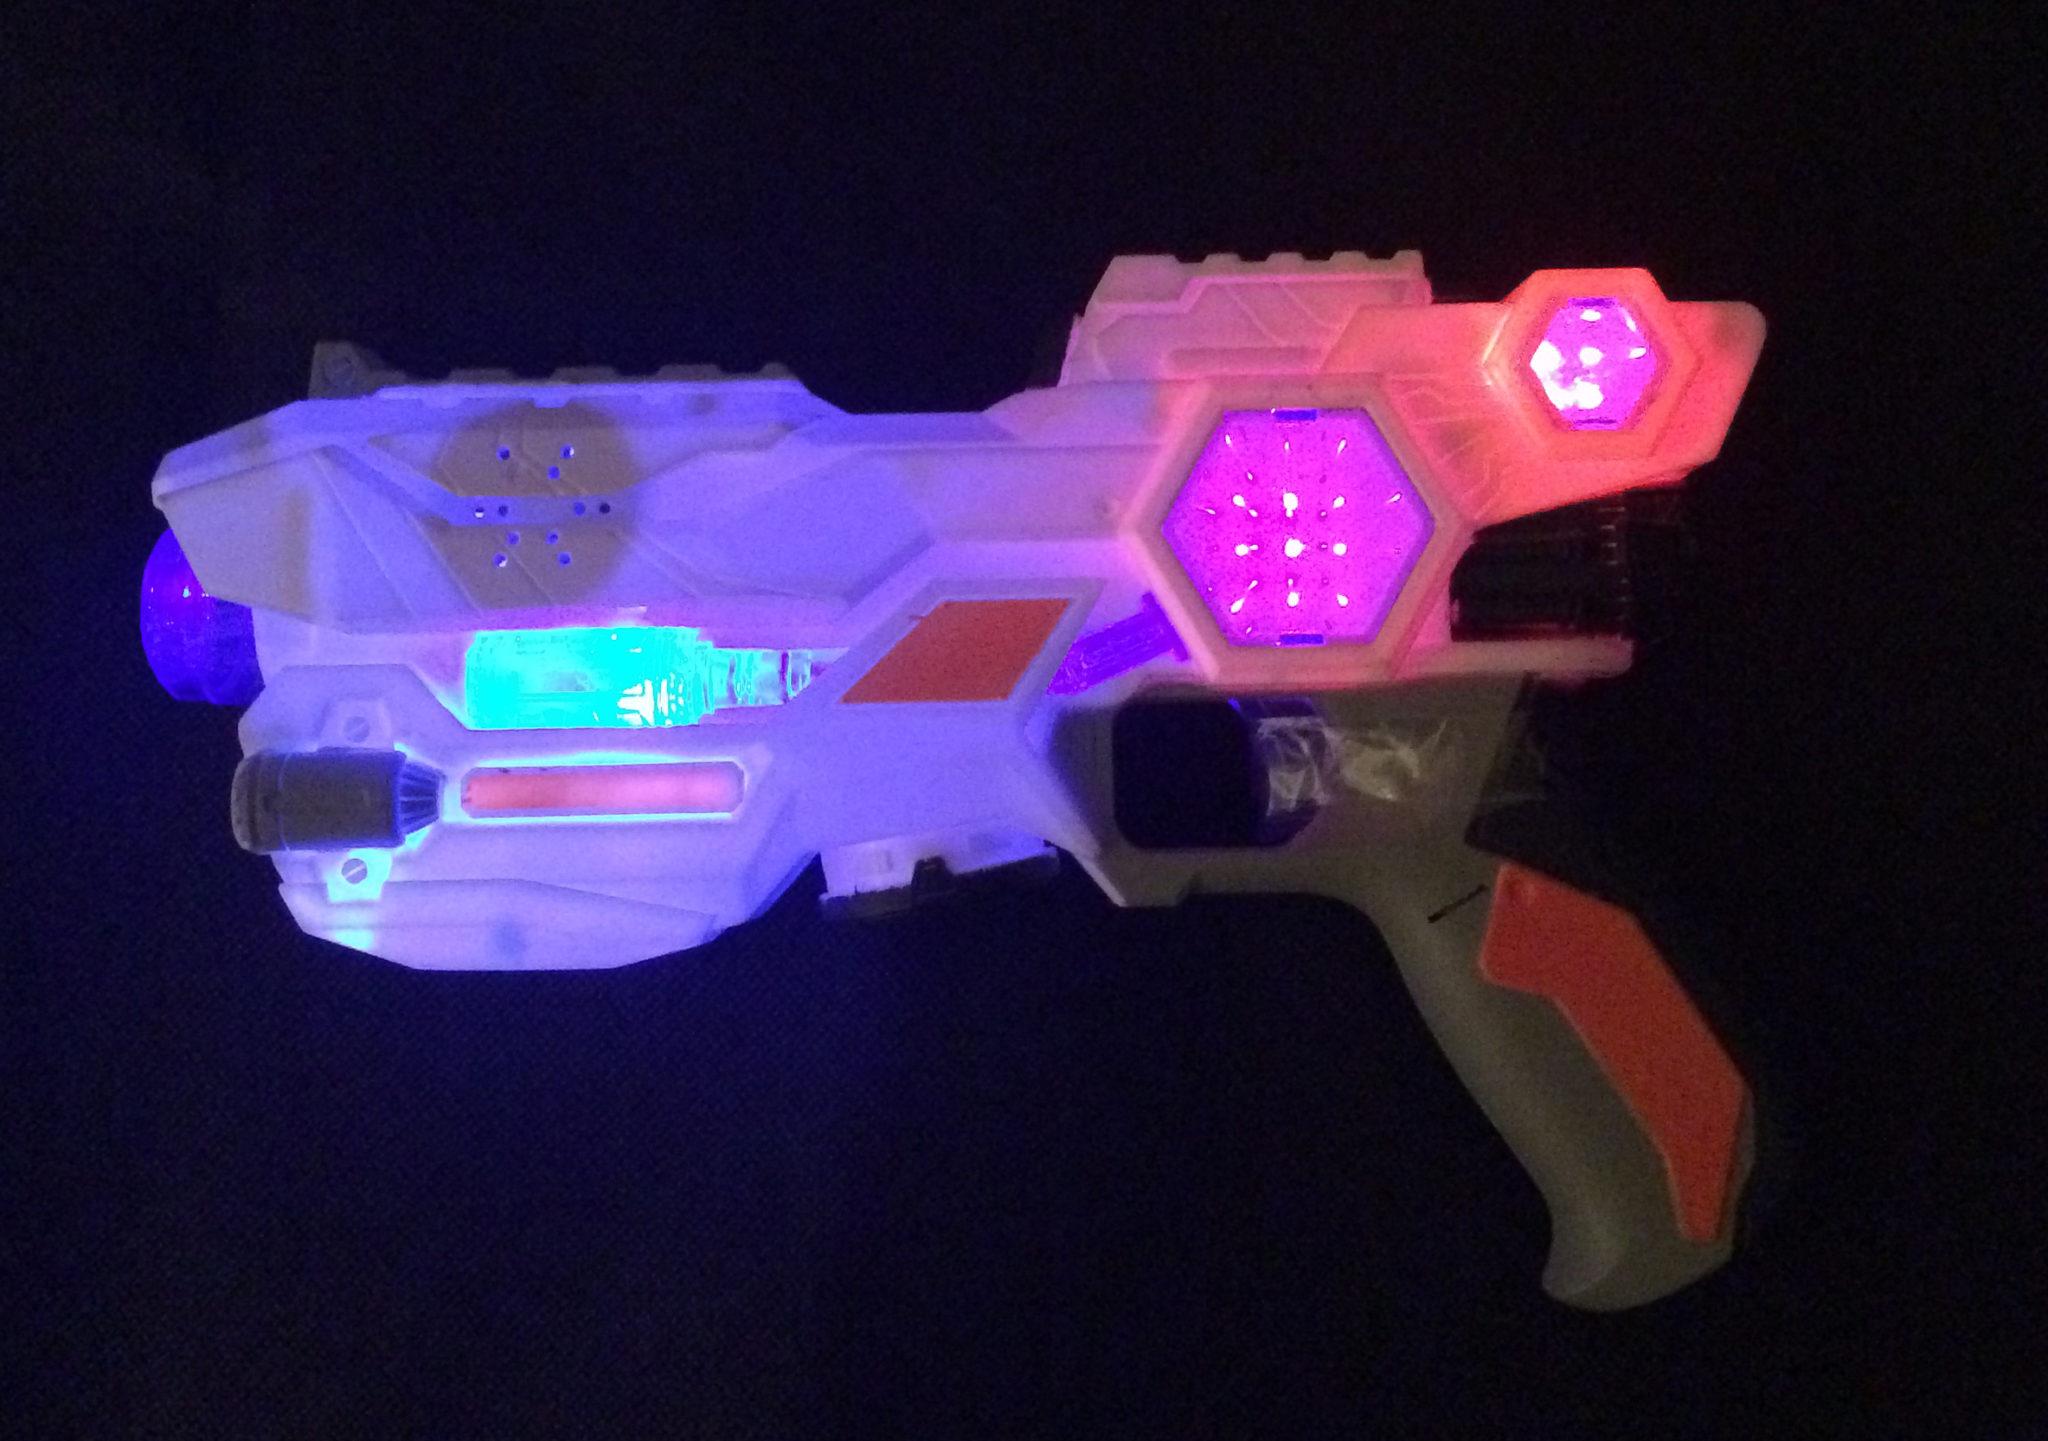 Space Wars Blaster Lit Up